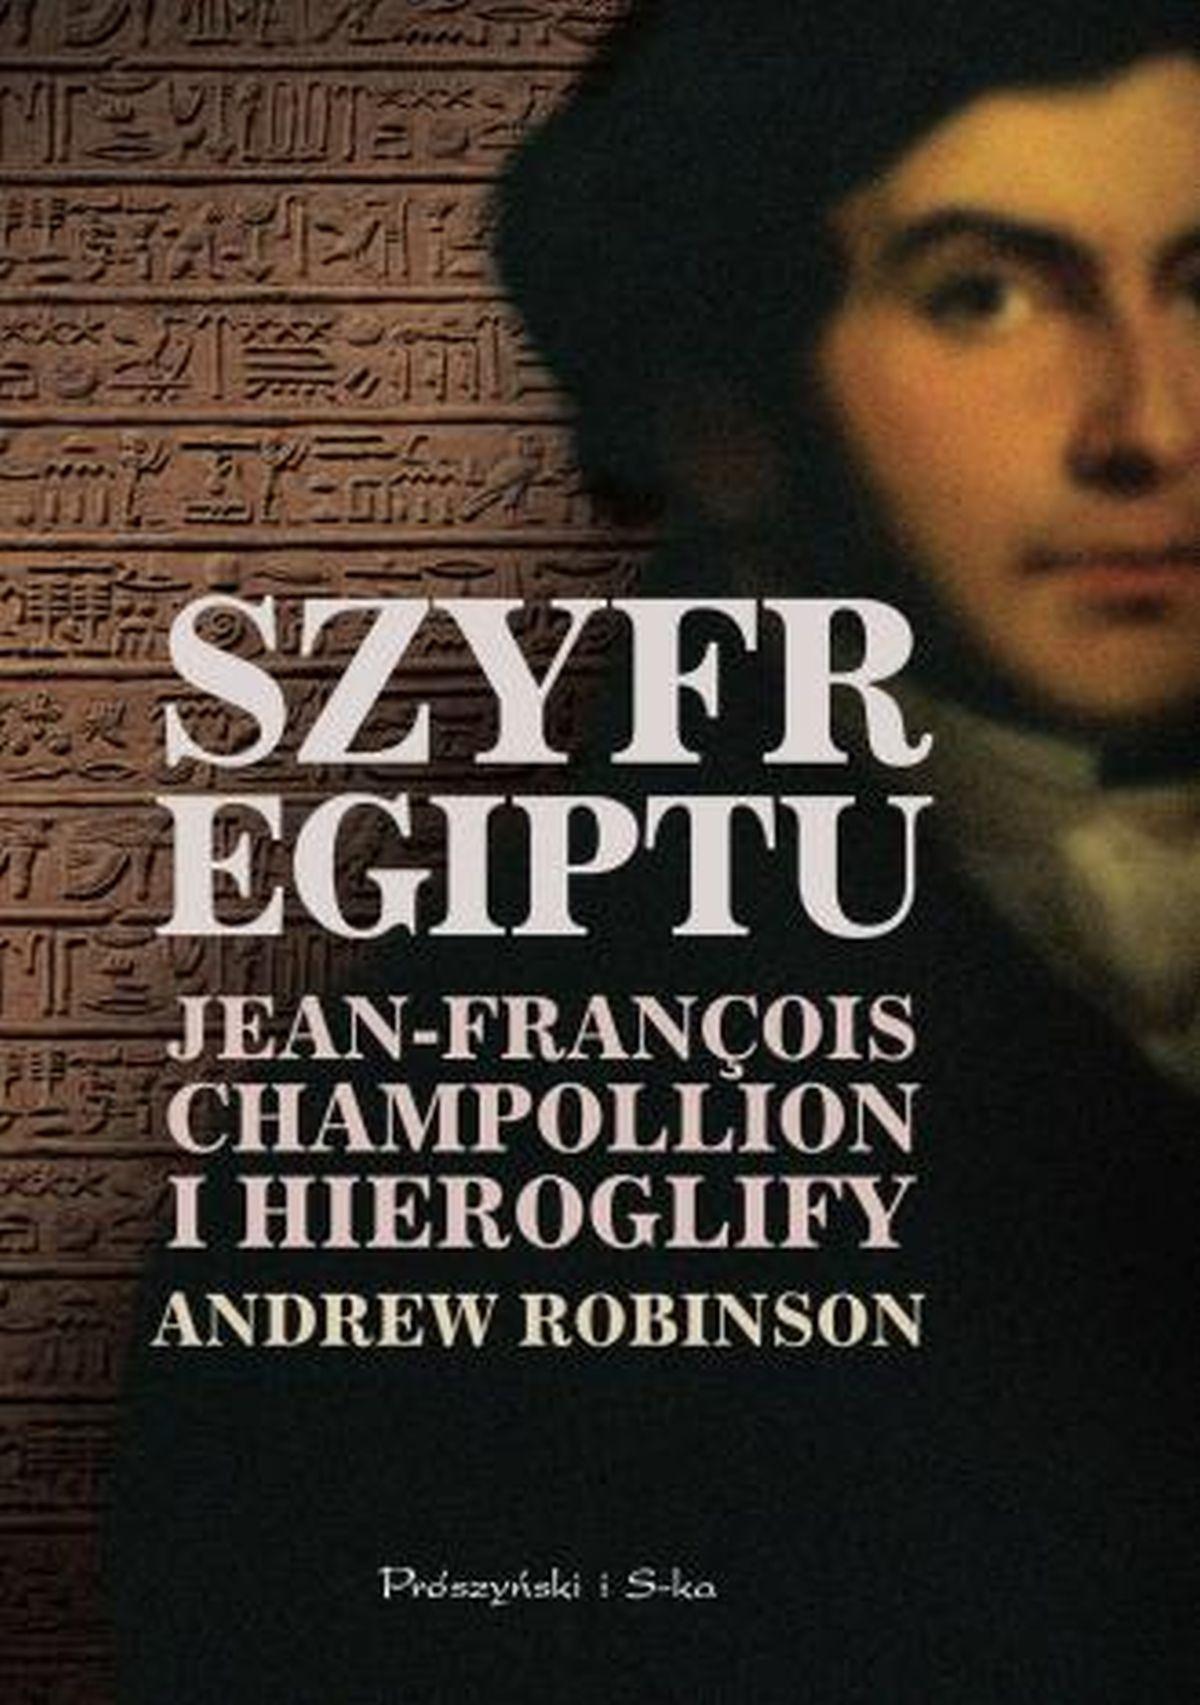 Szyfr Egiptu. Jean-Francois Champollion i hieroglify